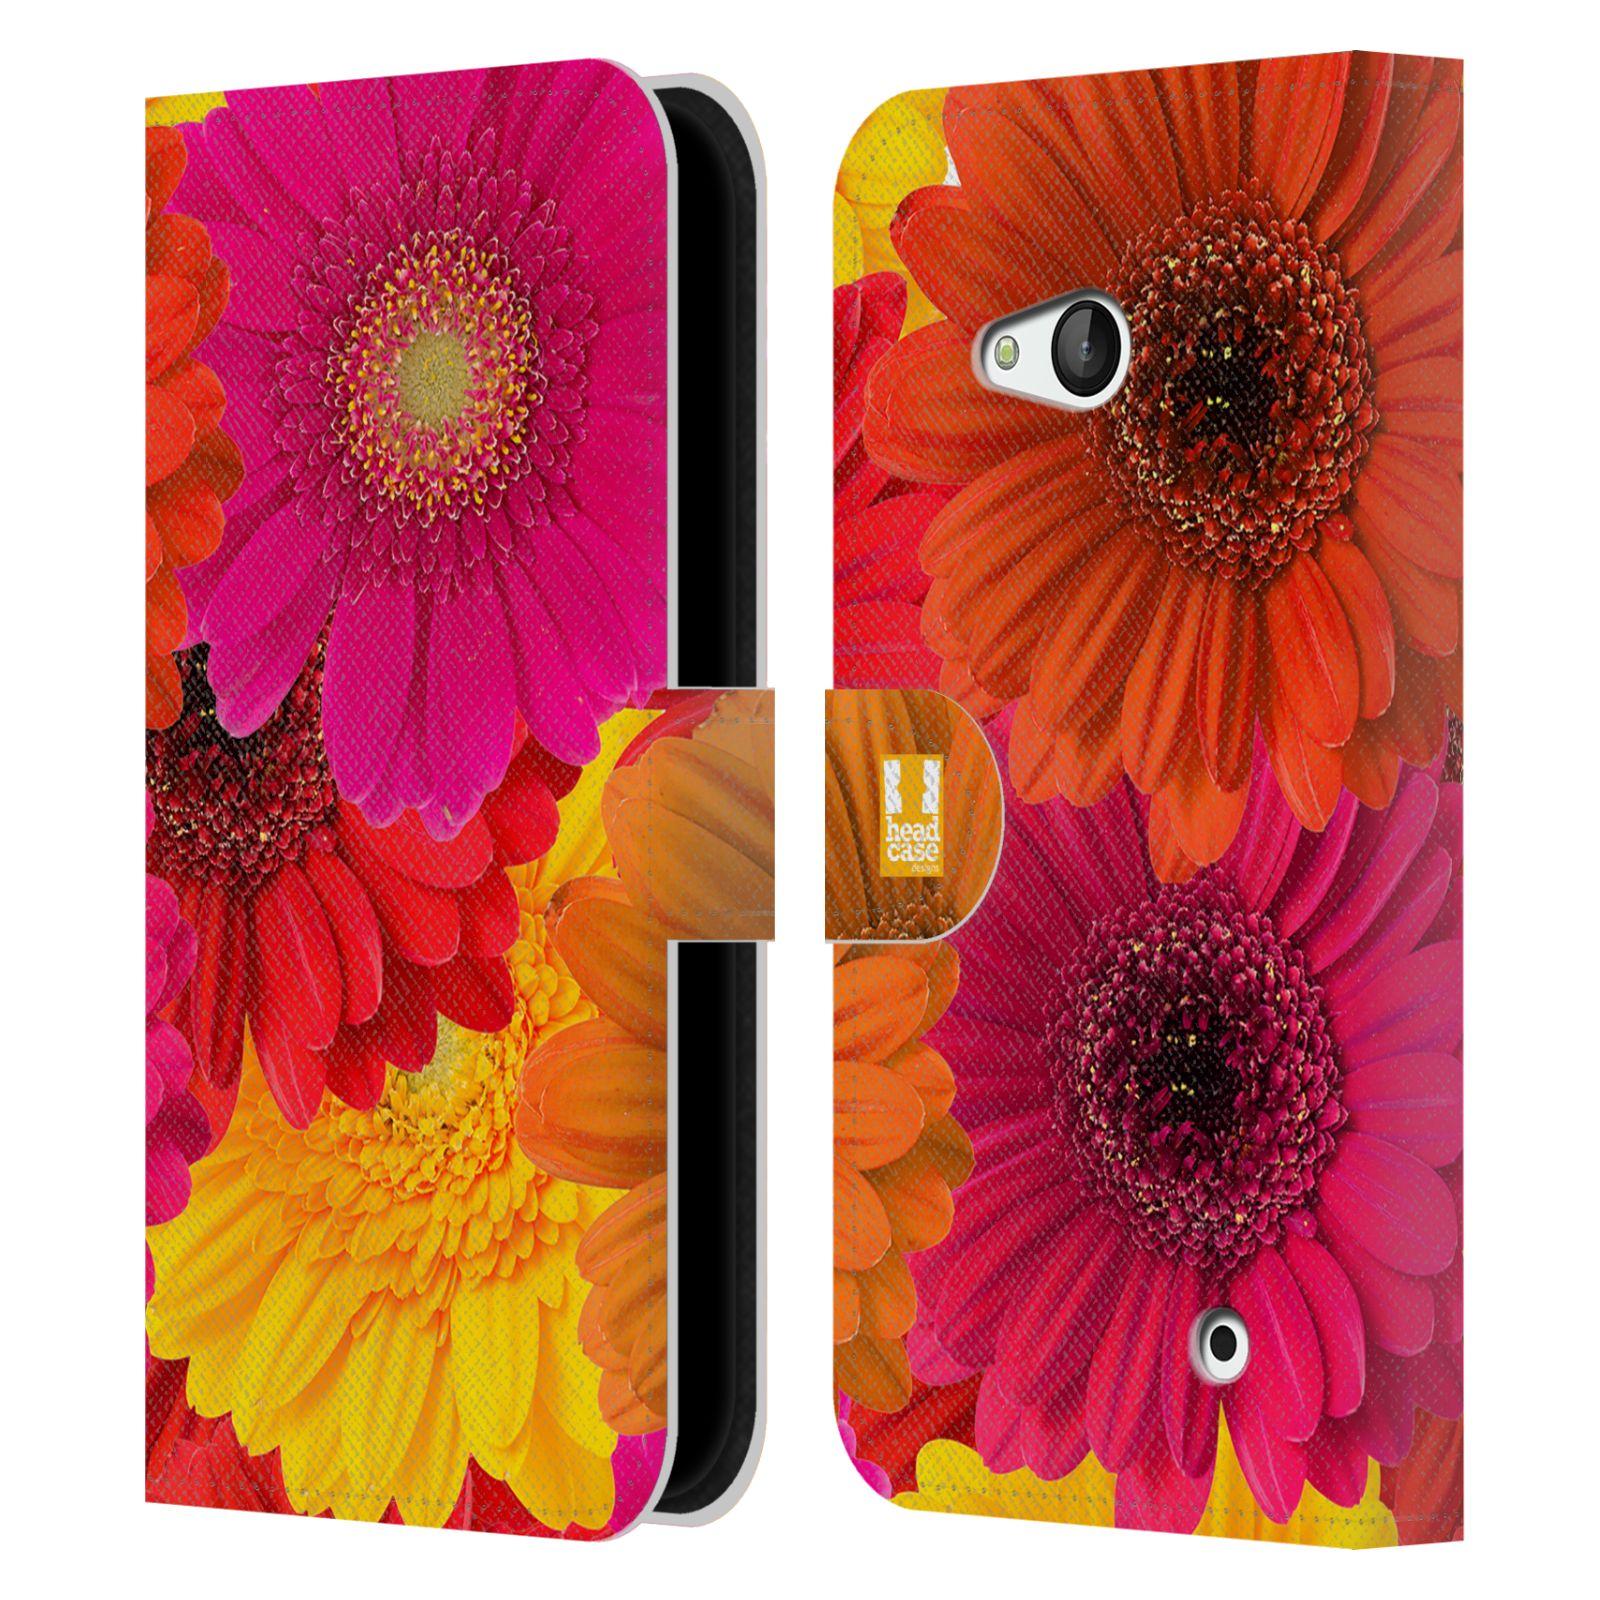 HEAD CASE Flipové pouzdro pro mobil NOKIA / MICROSOFT LUMIA 640 / LUMIA 640 DUAL květy foto fialová, oranžová GERBERA